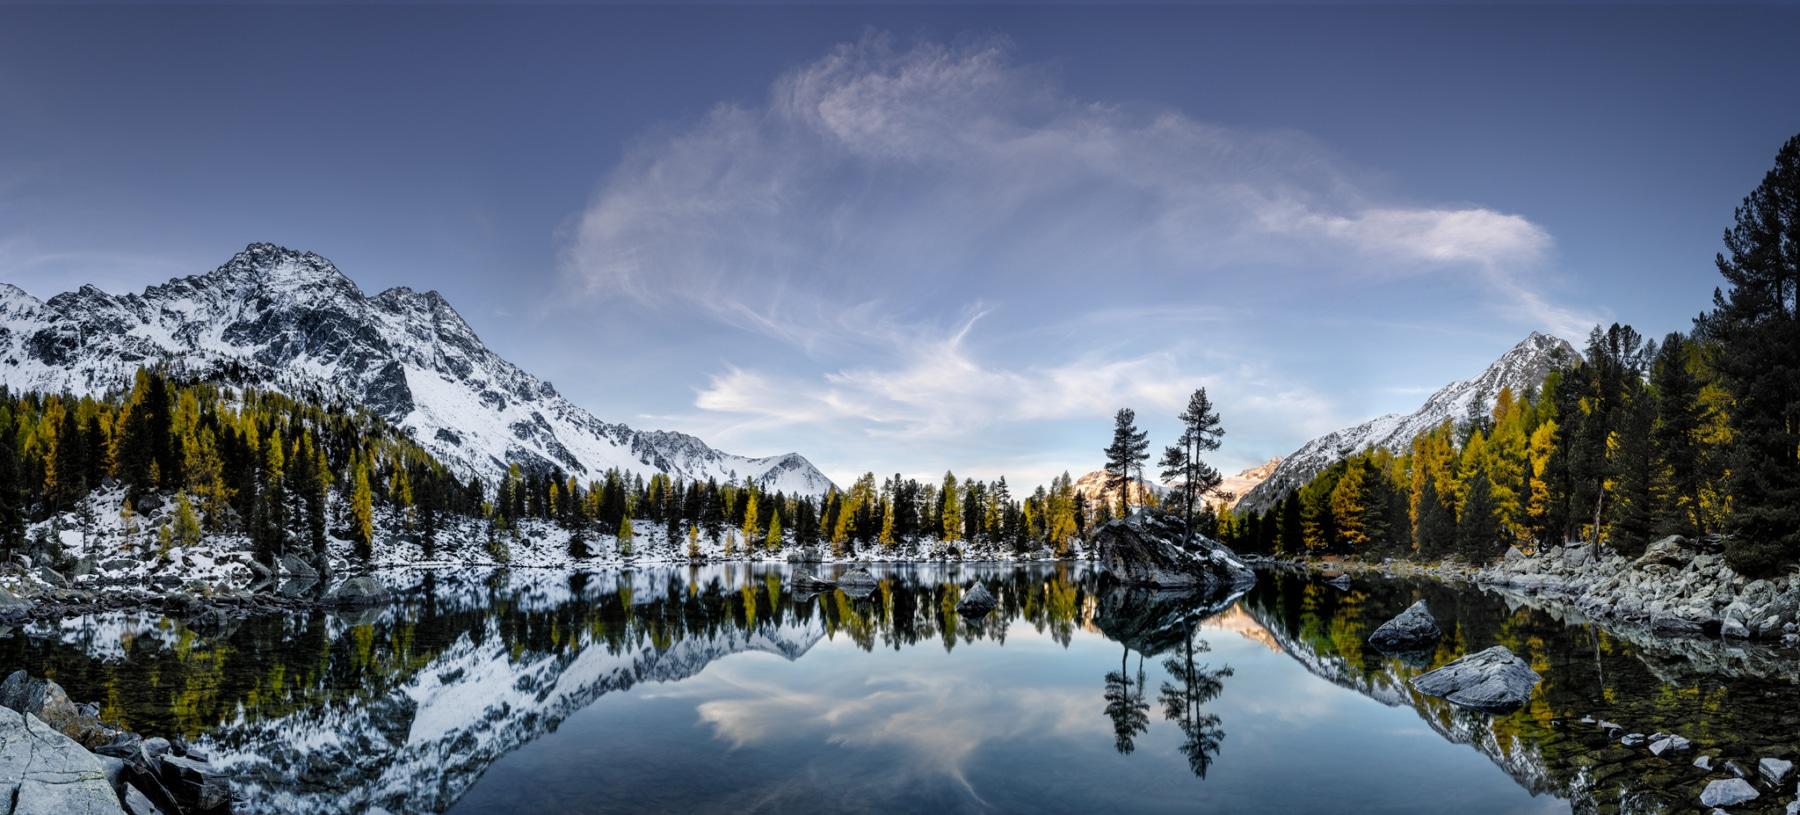 Schweiz, Engadin, Puschlav, Val di Campo, Lagh da Saoseo